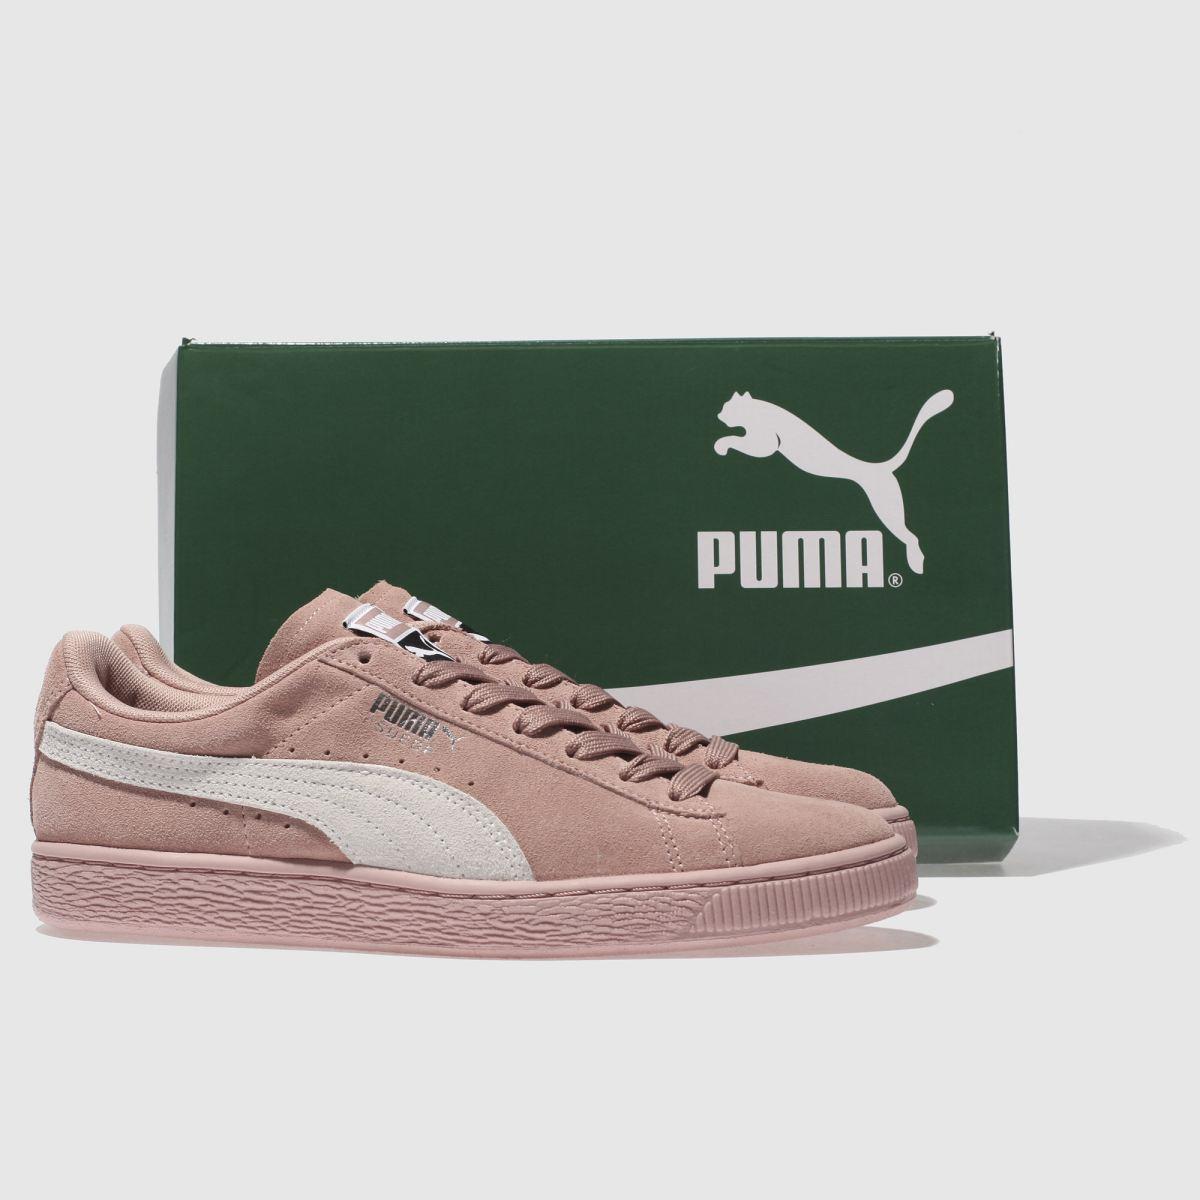 Damen Pink puma Suede Classic Qualität Sneaker | schuh Gute Qualität Classic beliebte Schuhe 9f6fcd